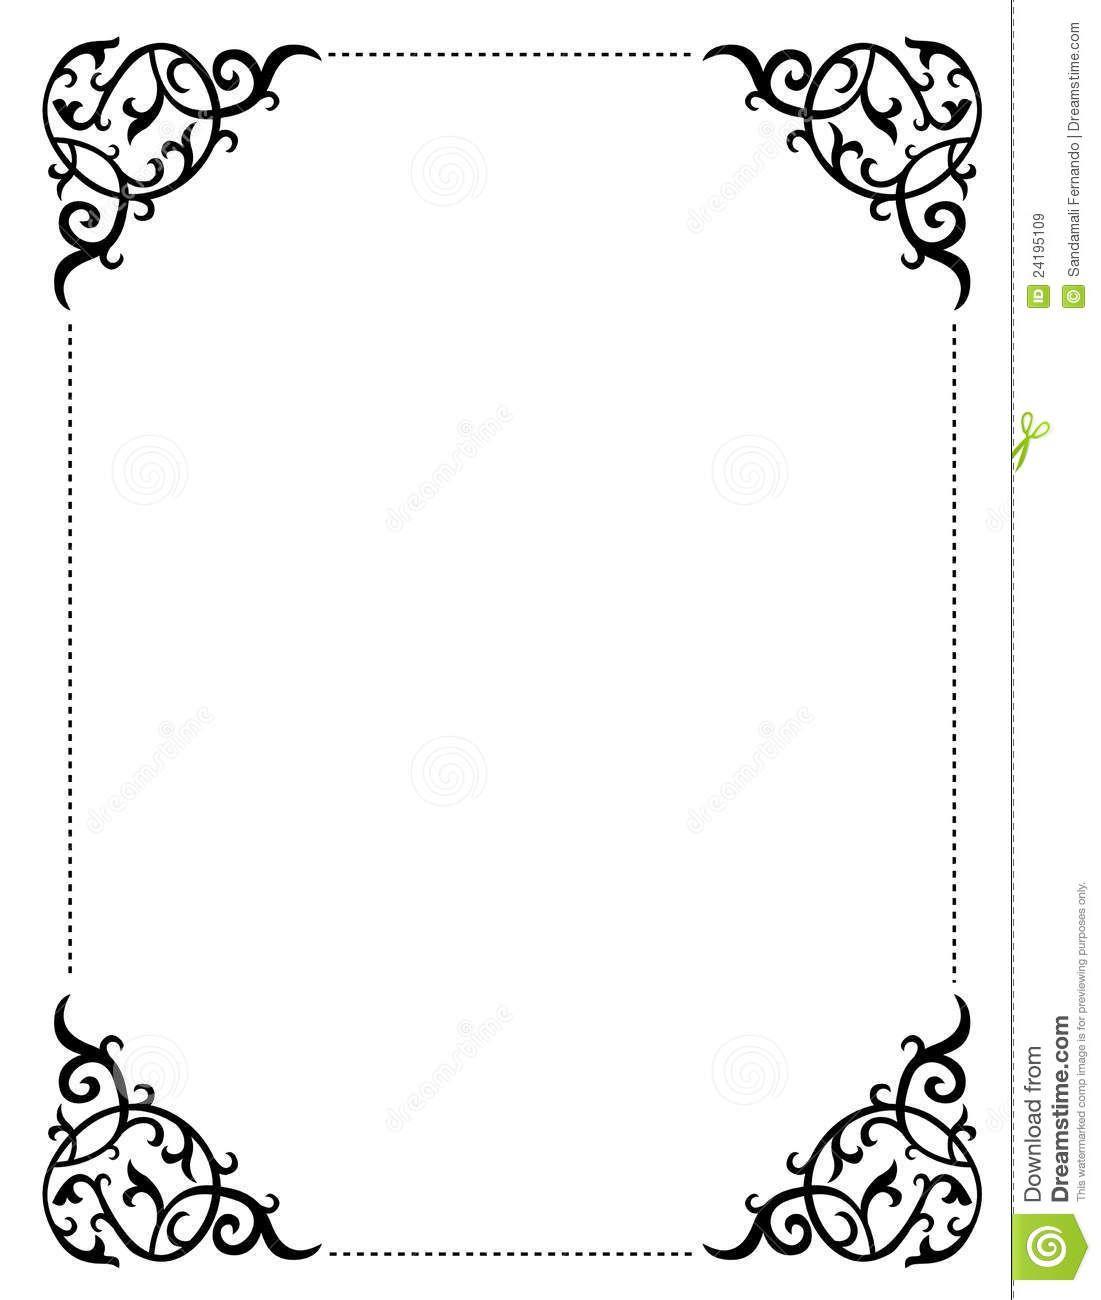 Free printable clip art. Boarder clipart wedding